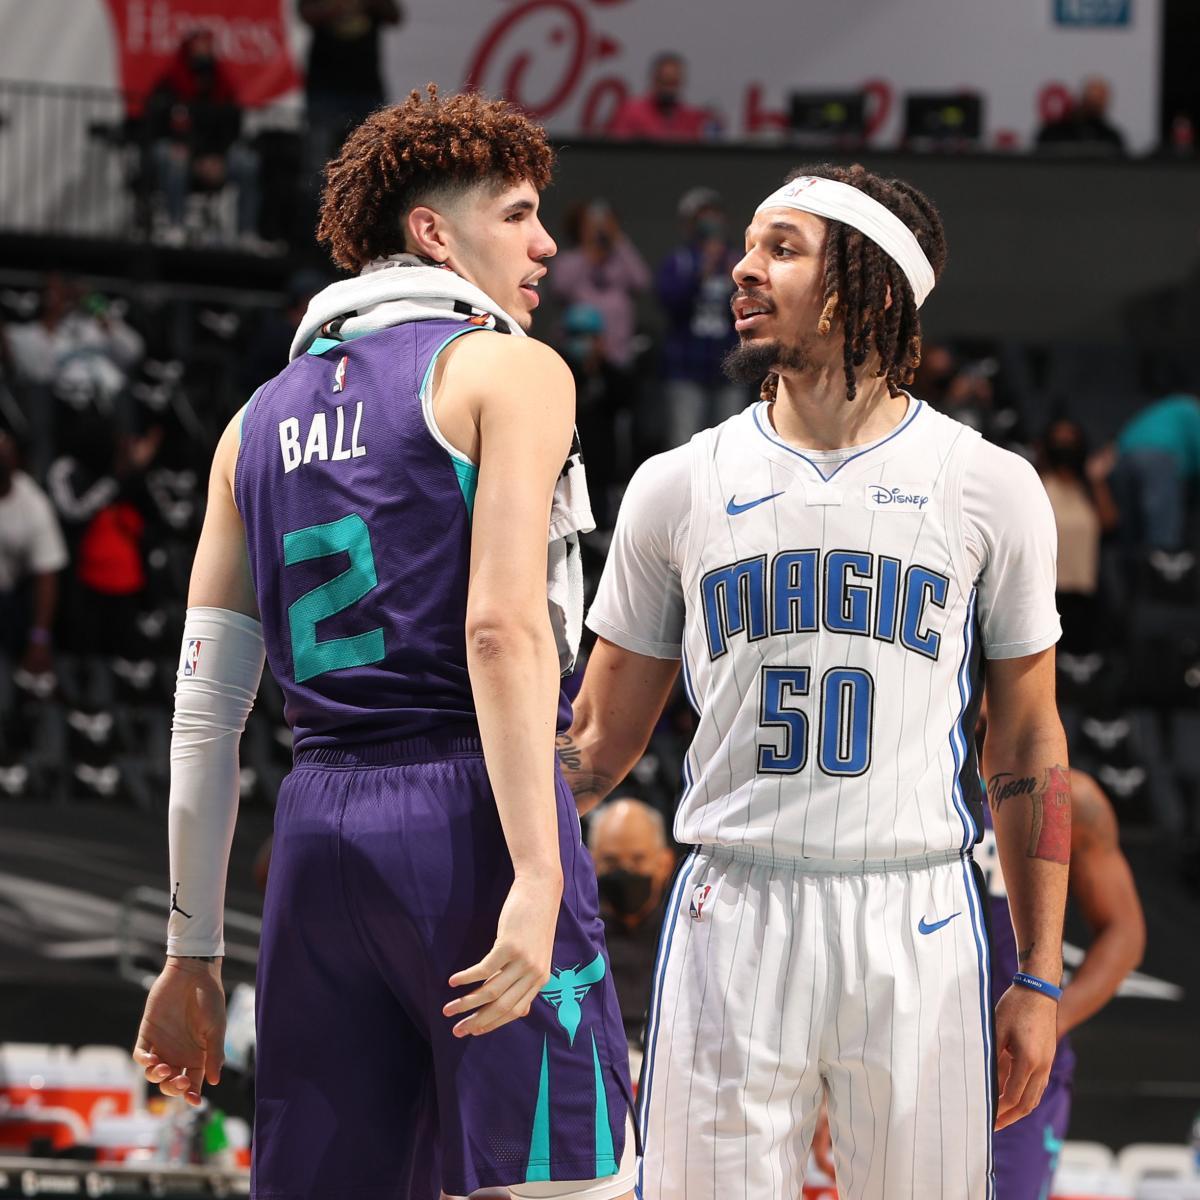 The Way NBA's Top Rookies Can Avoid Sophomore Slump Next Season thumbnail